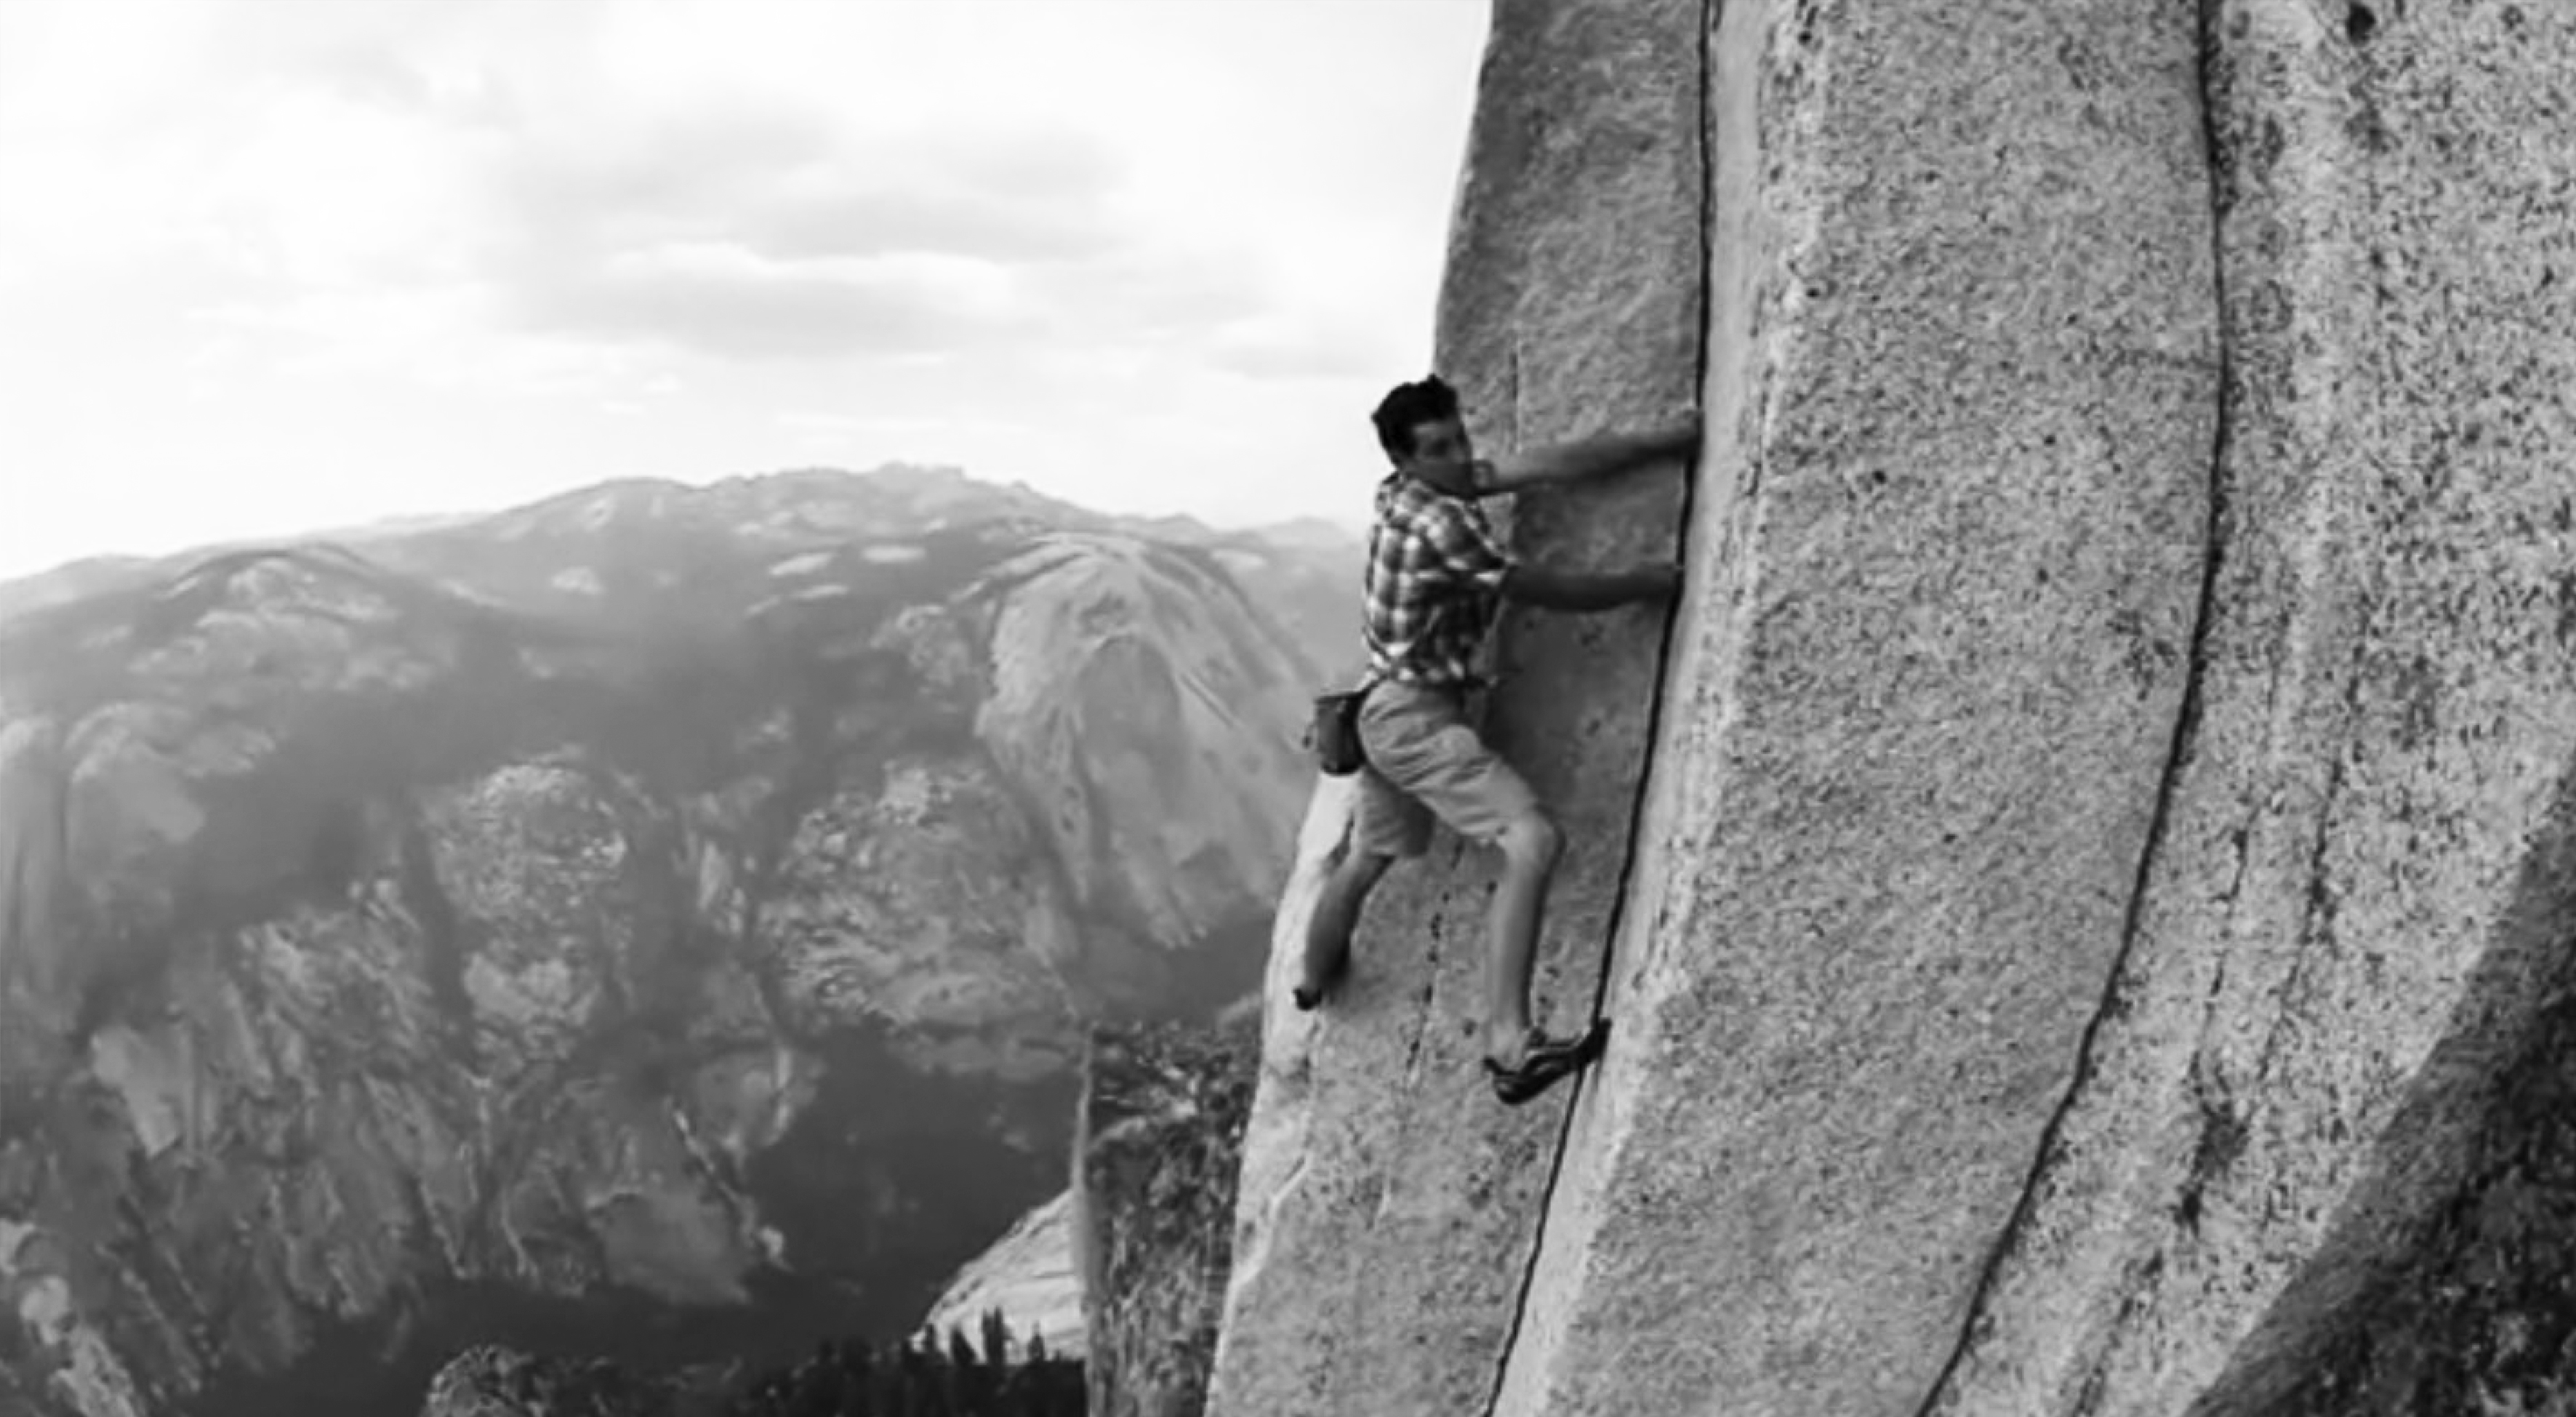 Free-solo climber climbing Half Dome in Yosemite National Park